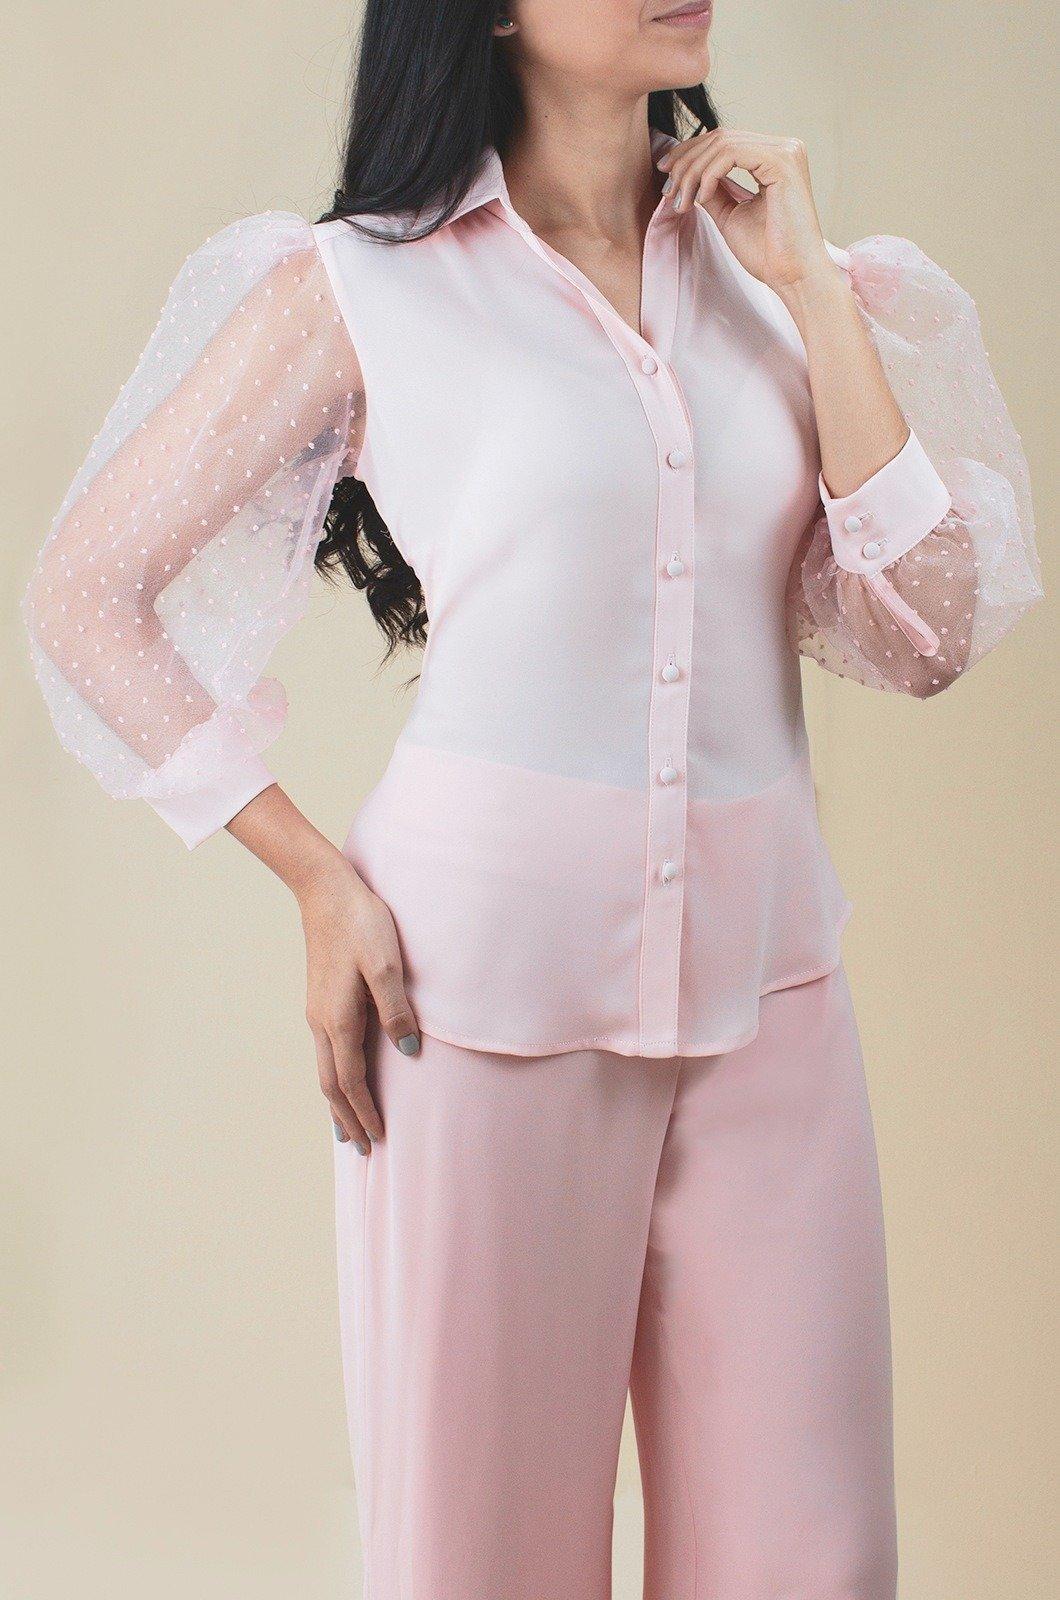 Blusa camisera con mangas bombachas - Chazari 4030-20 ROSA